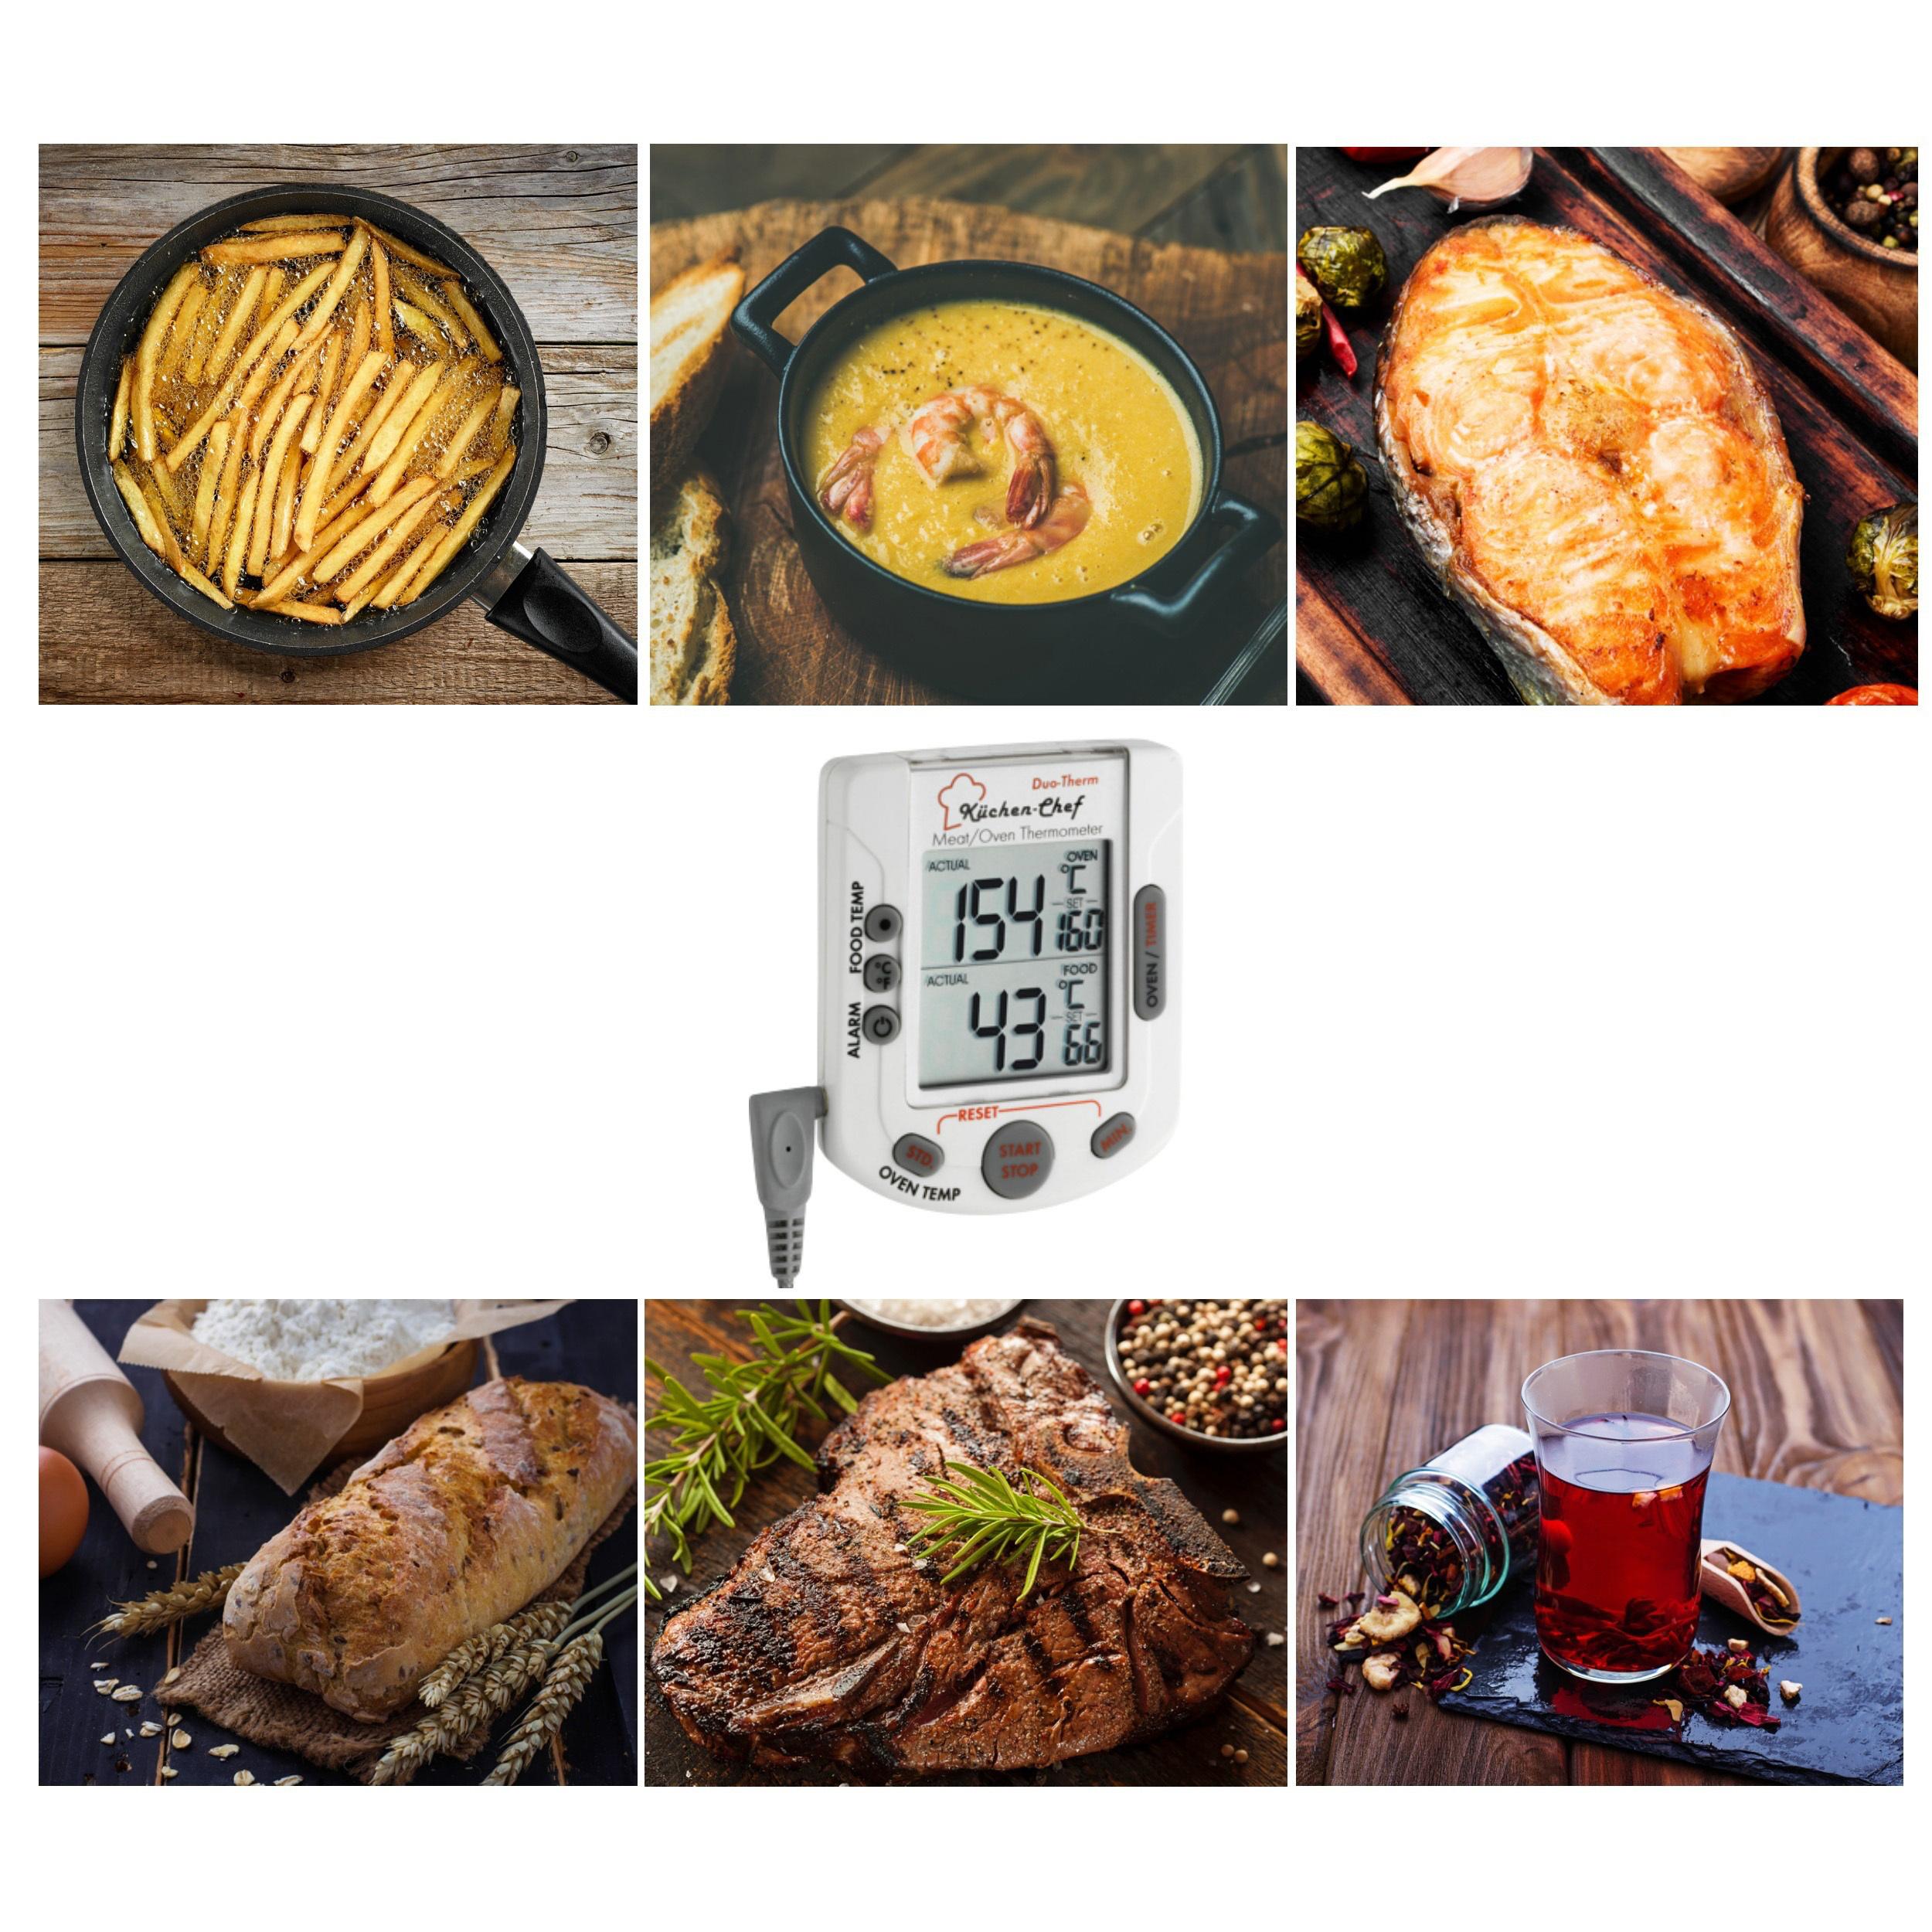 14-1503-digitales-grill-braten-ofenthermometer-küchen-chef-duo-therm-anwendung-1200x1200px.jpg